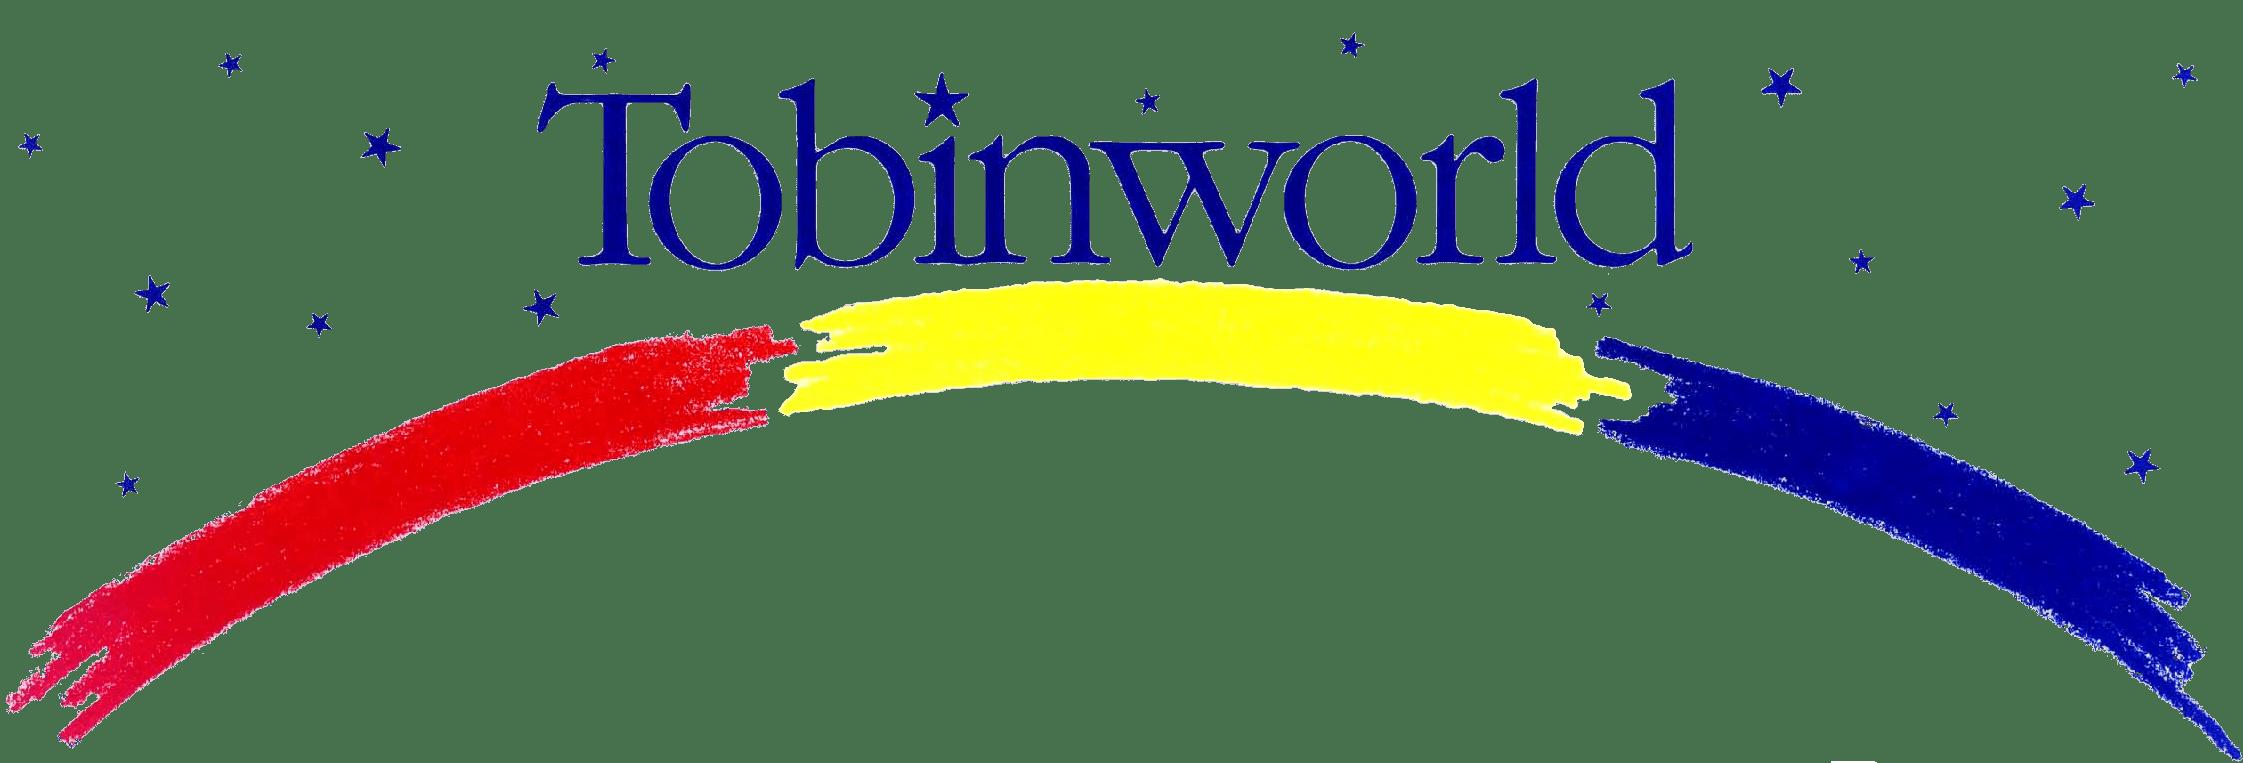 Tobinworld logo-transparent